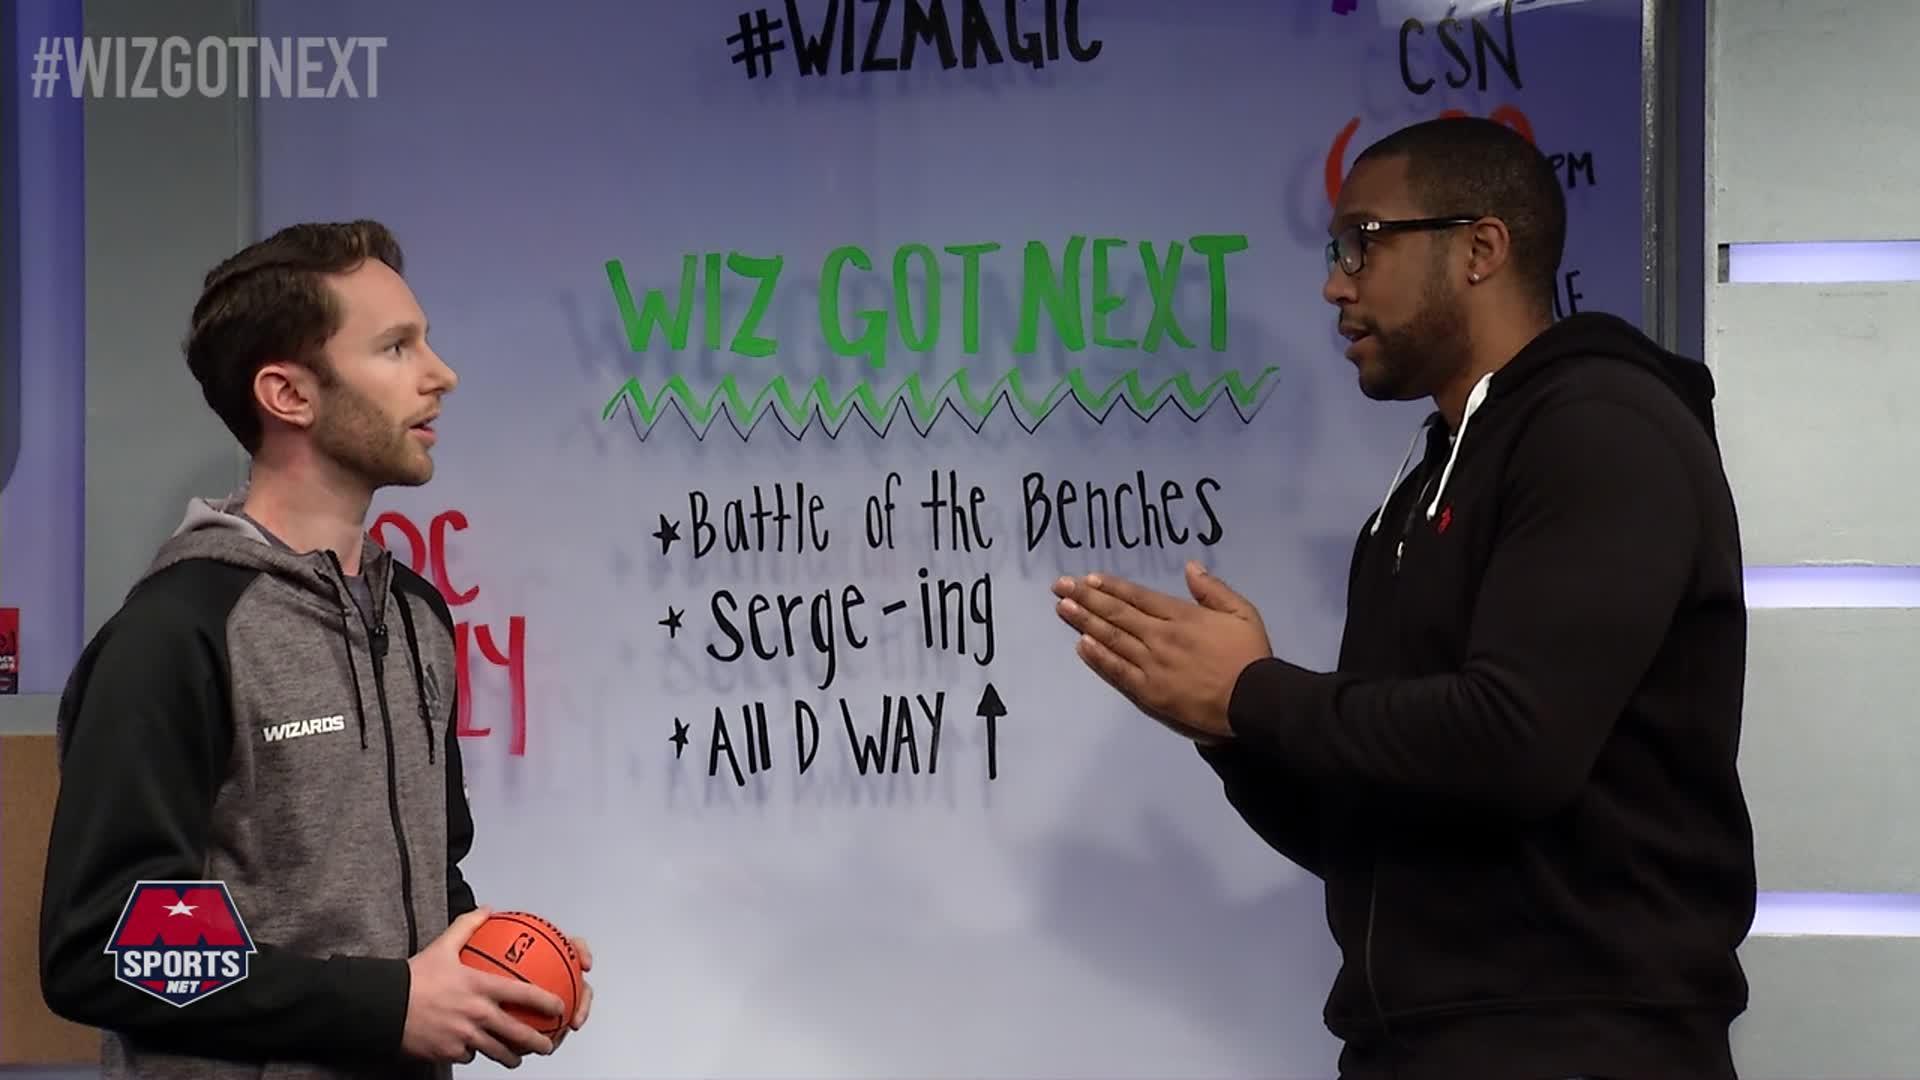 Wiz Got Next: Wiz vs Magic Pt 1 12-6-16